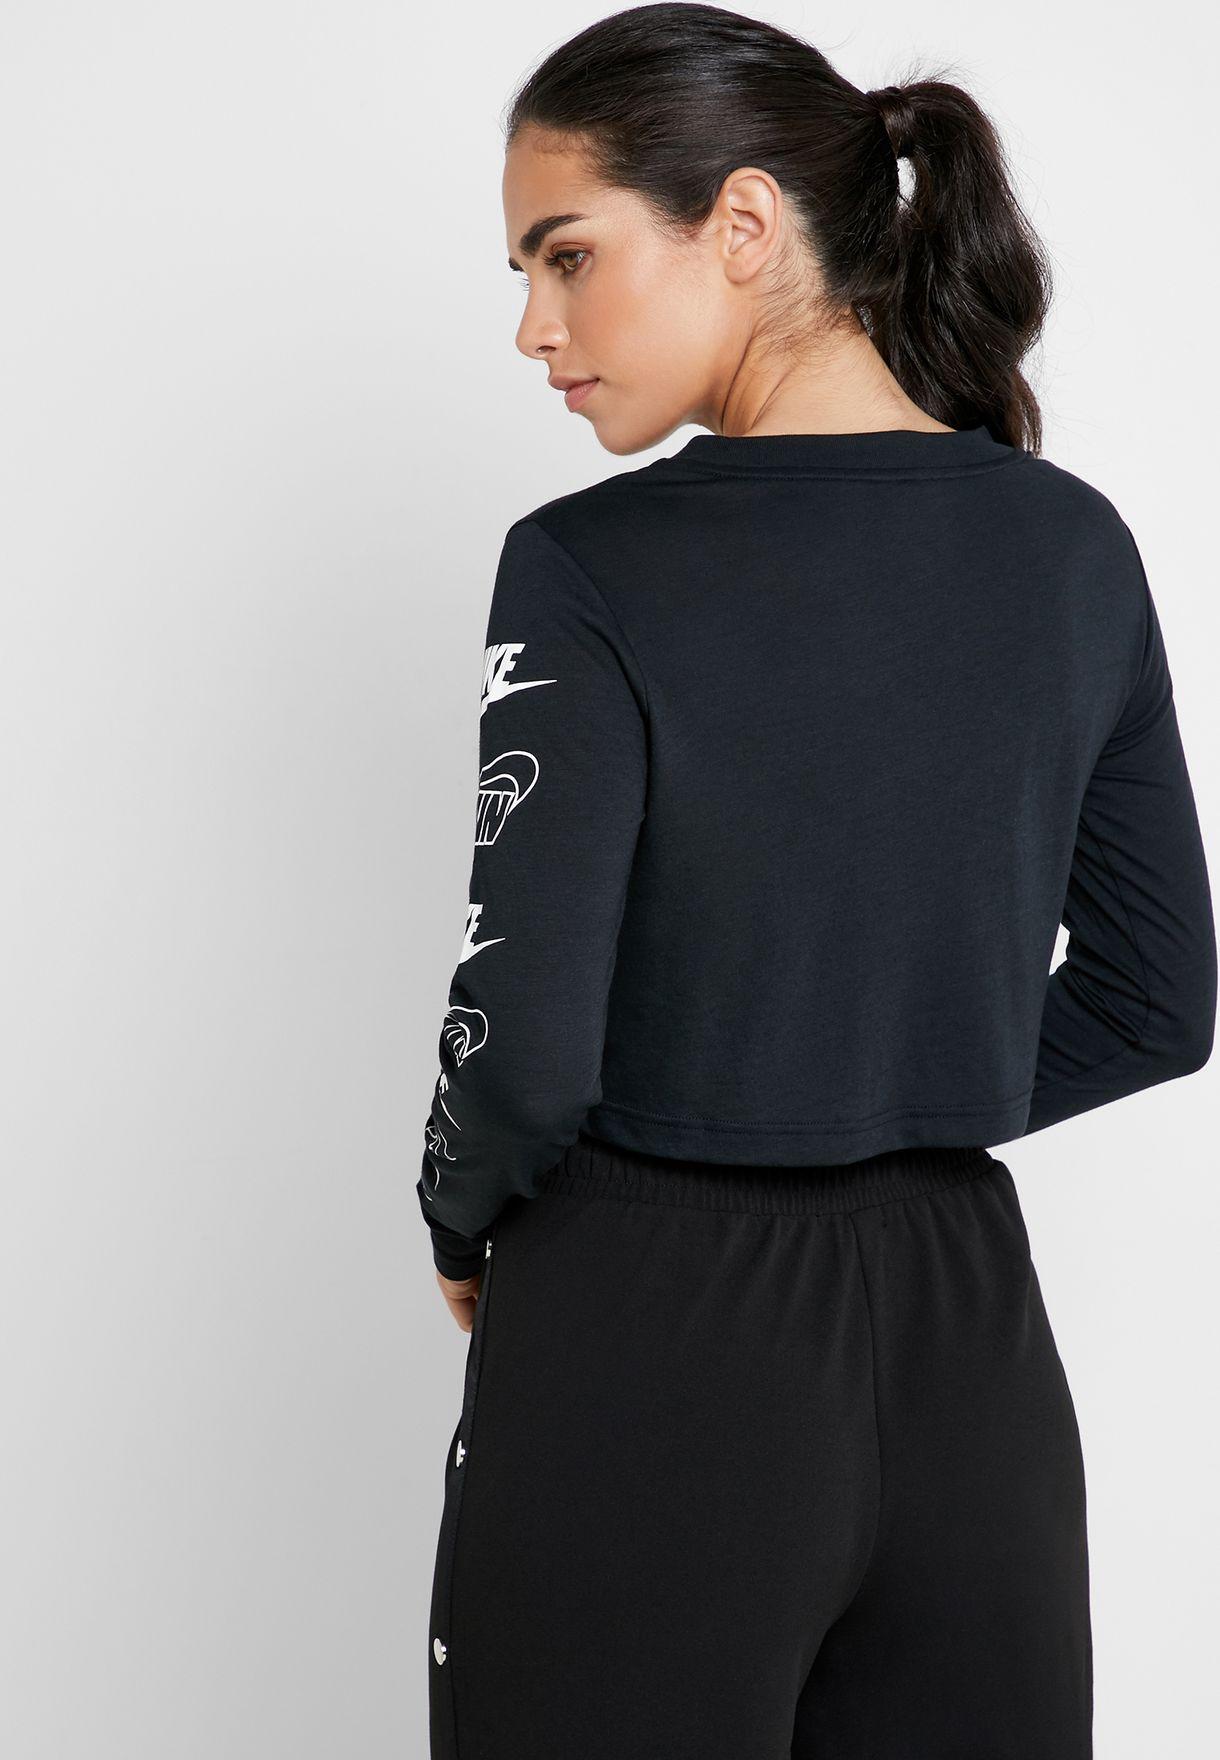 NSW Futura Flip Cropped T-Shirt